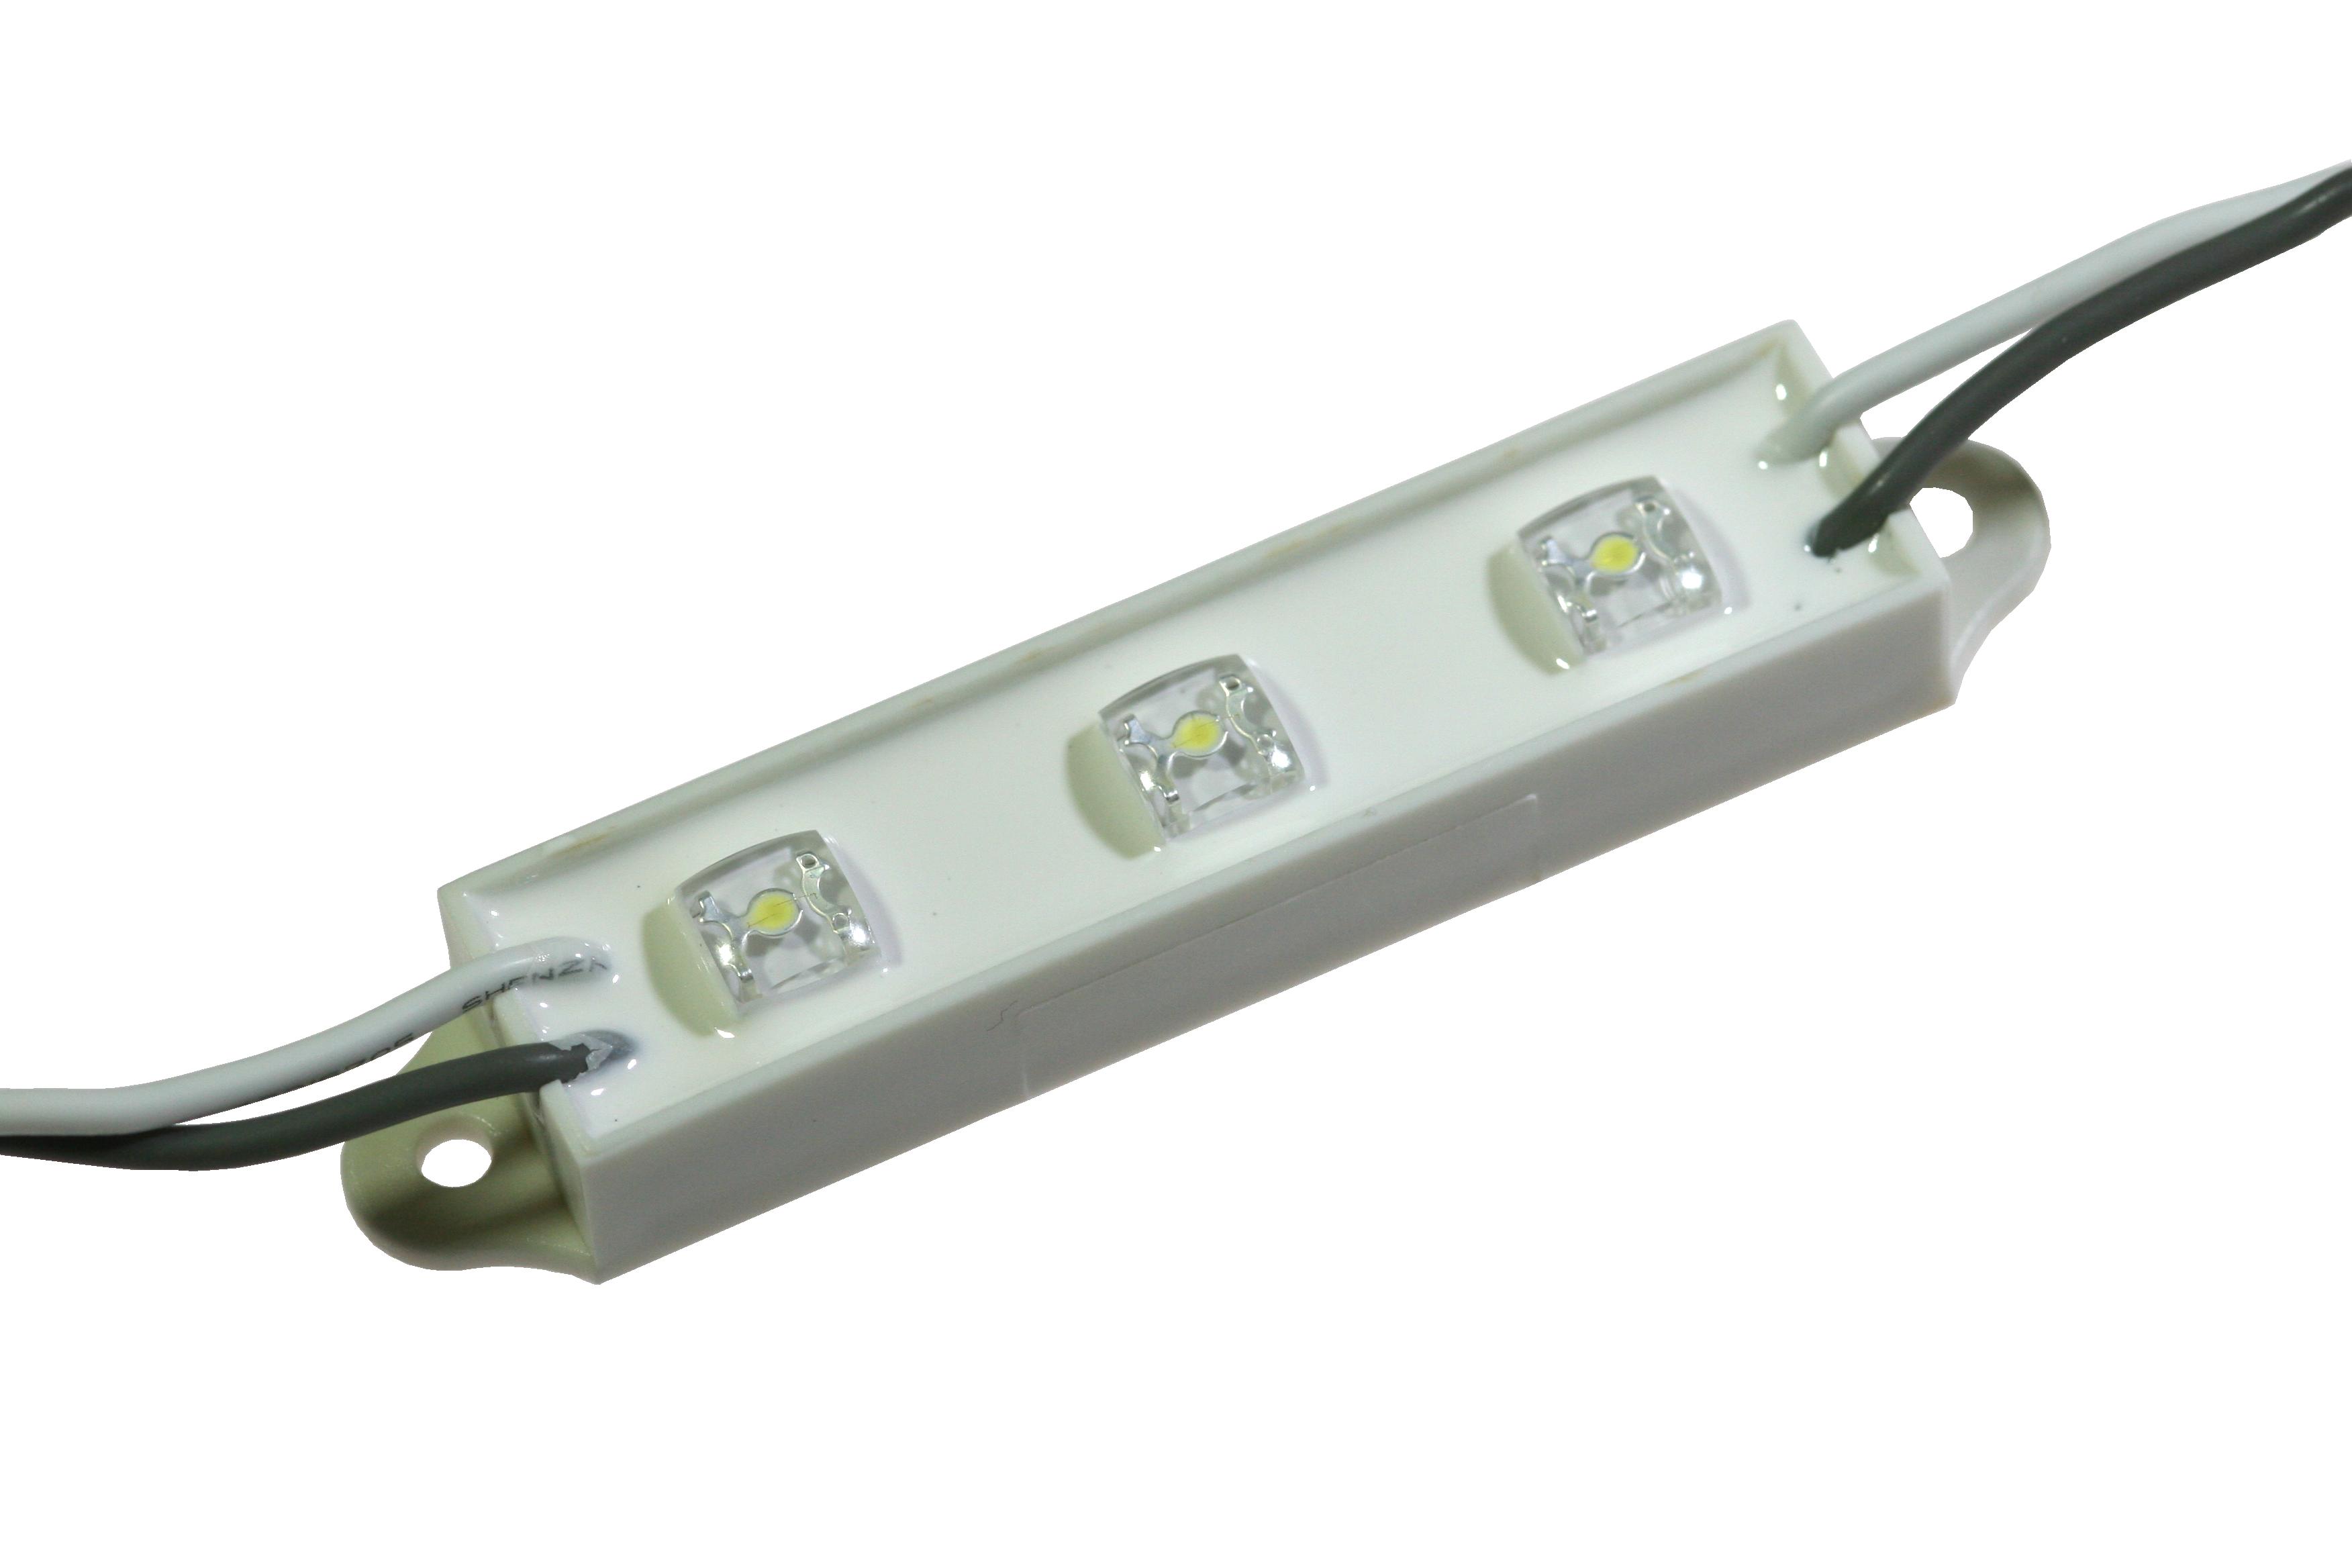 OVM12F3R7 by TT Electronics/Optek Technology